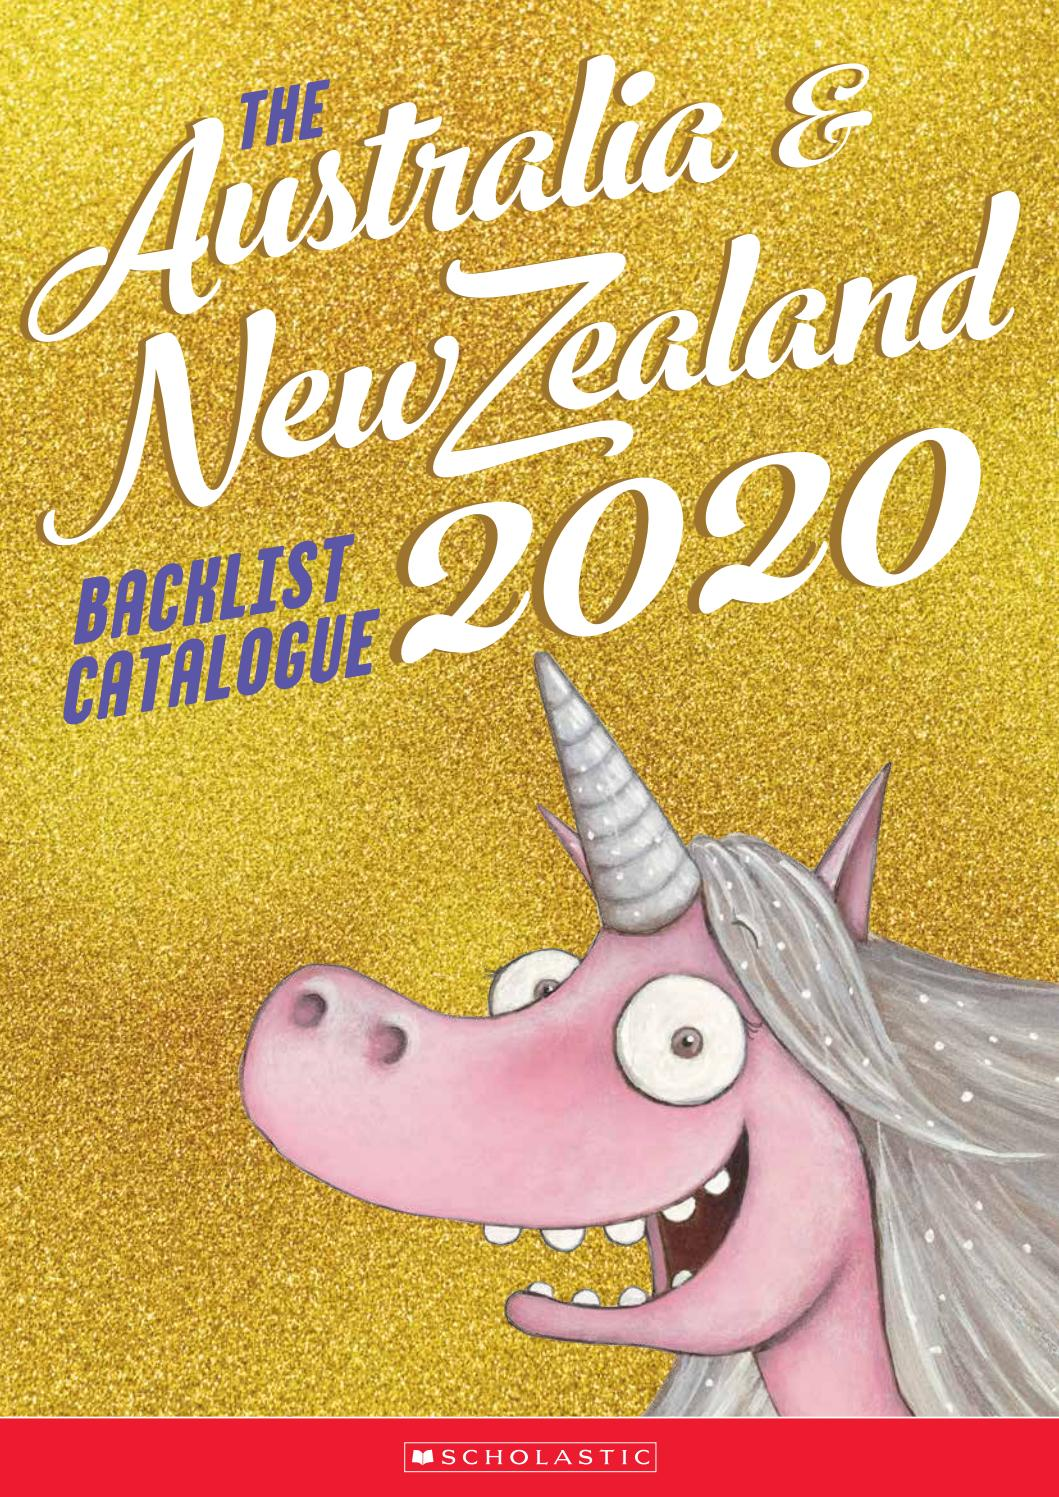 2020 Scholastic Backlist Catalogue Revised 2 0 By Scholastic Australia Issuu